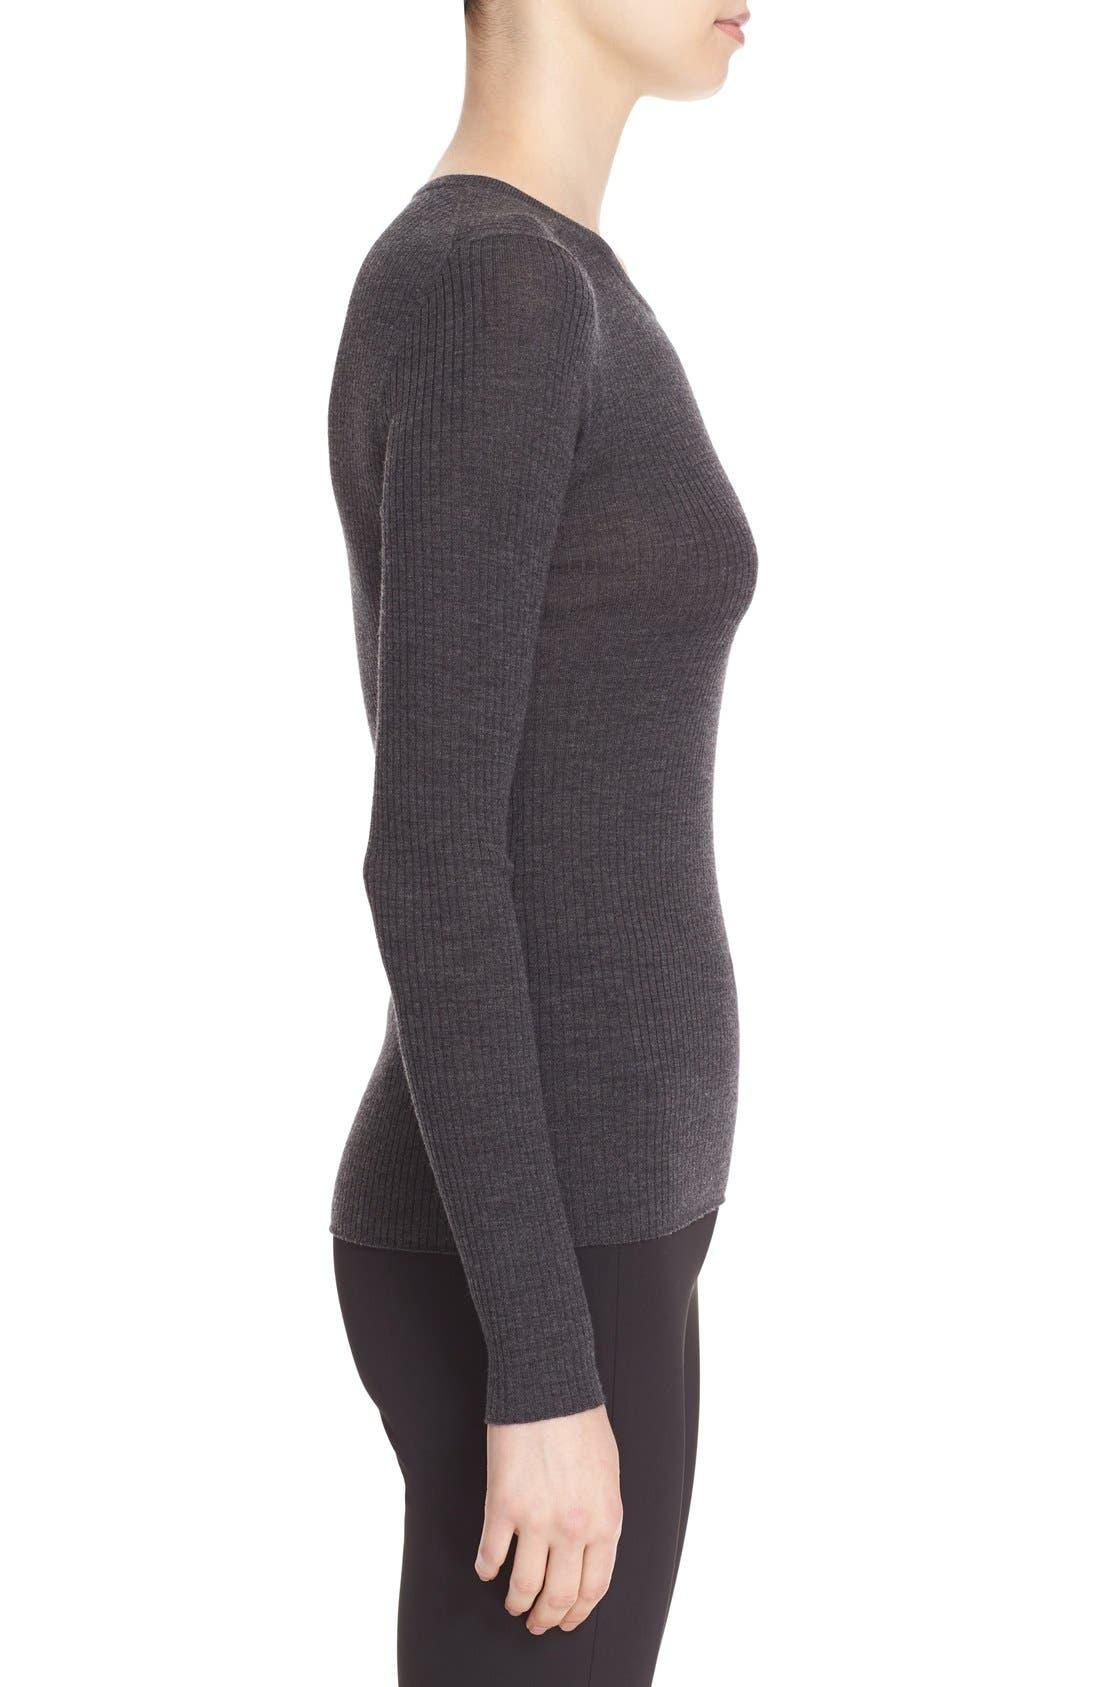 'Mirzi' Rib Knit Merino Wool Sweater,                             Alternate thumbnail 3, color,                             CHARCOAL MELANGE